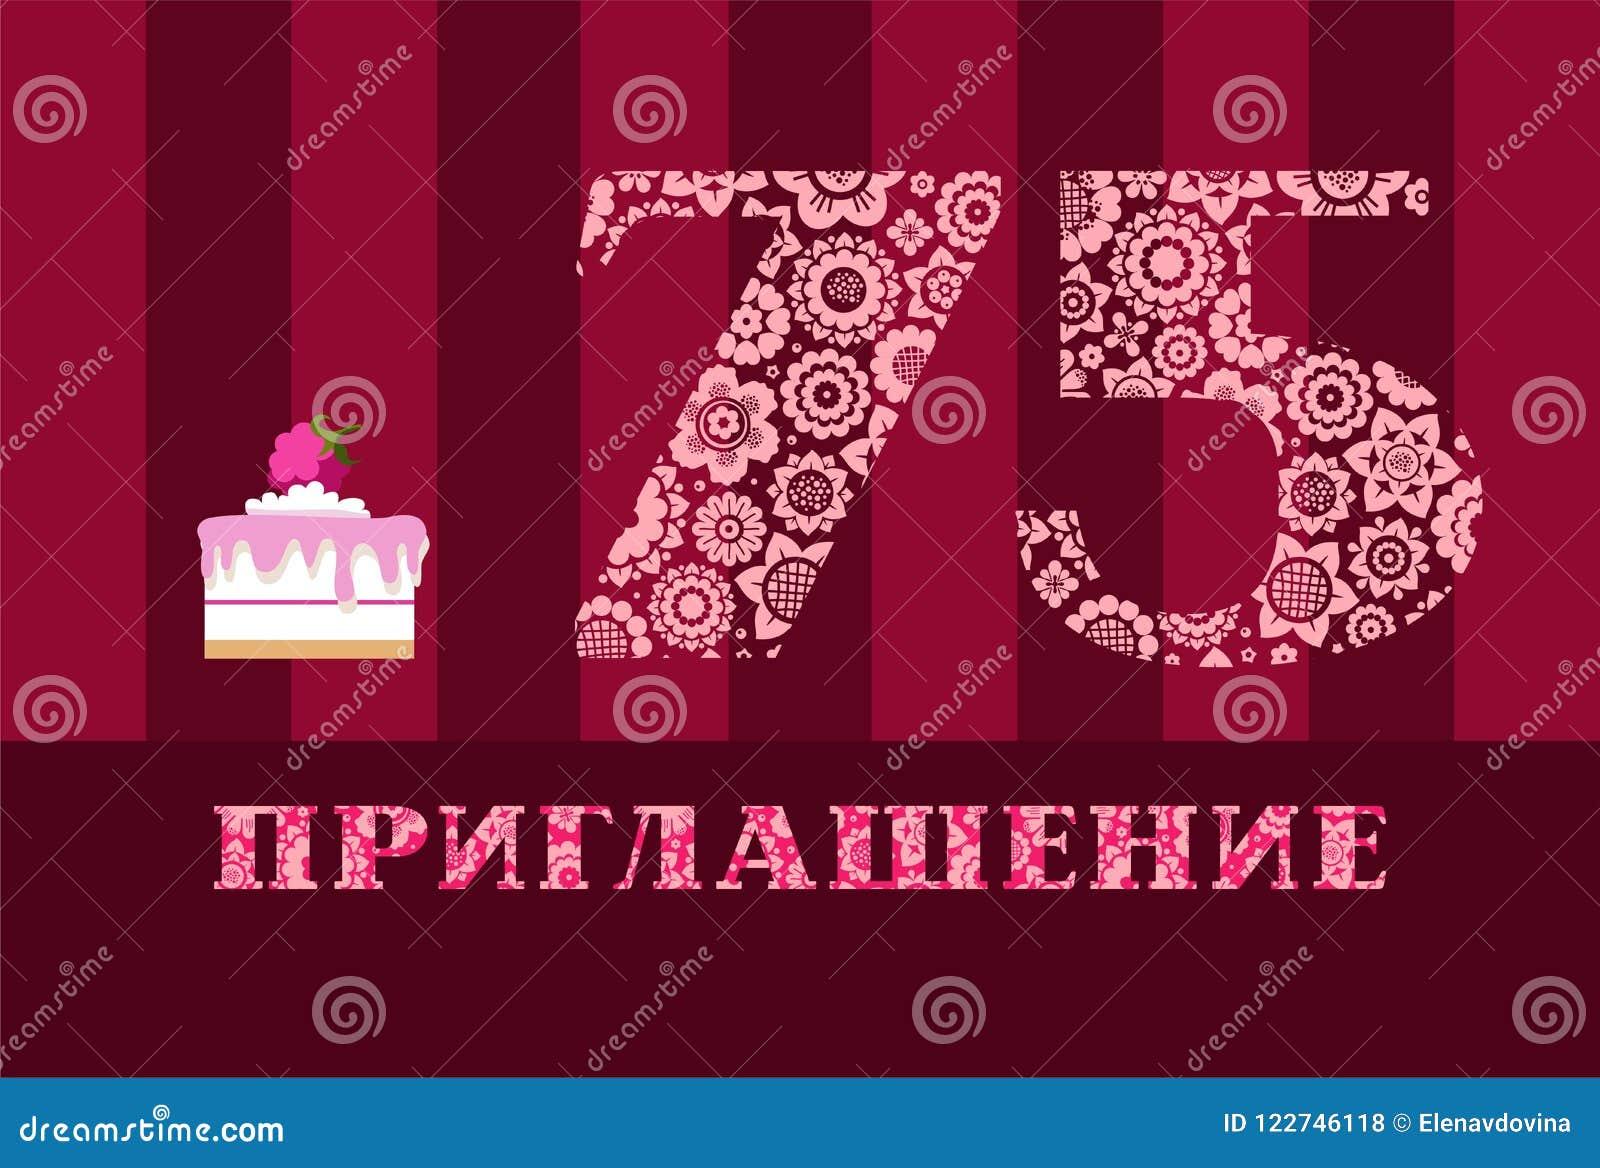 Invitation 75 Years Old Raspberry Cake Russian Language Vector